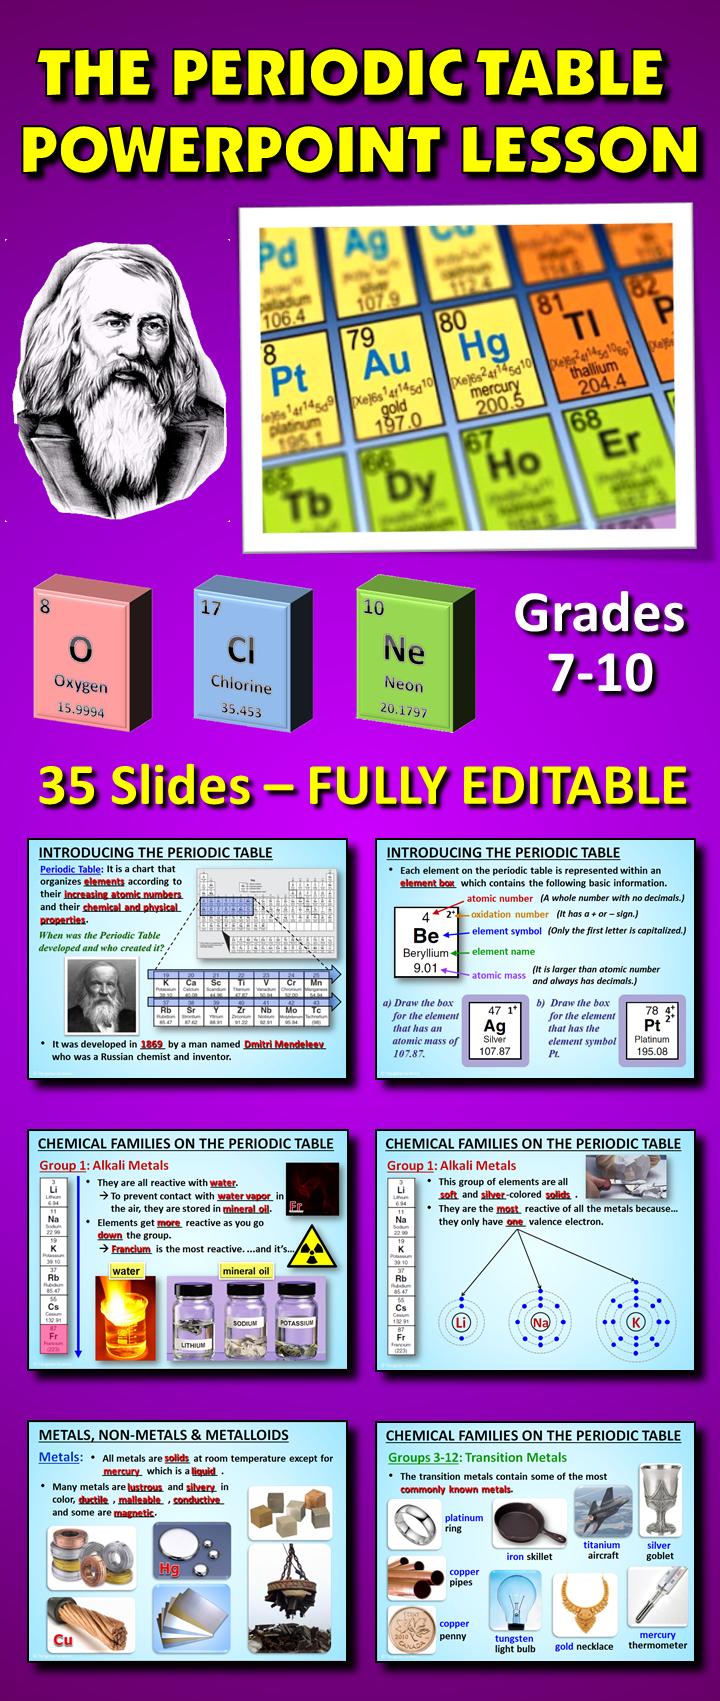 Periodic table powerpoint editable periodic table graphics periodic table powerpoint editable gamestrikefo Gallery